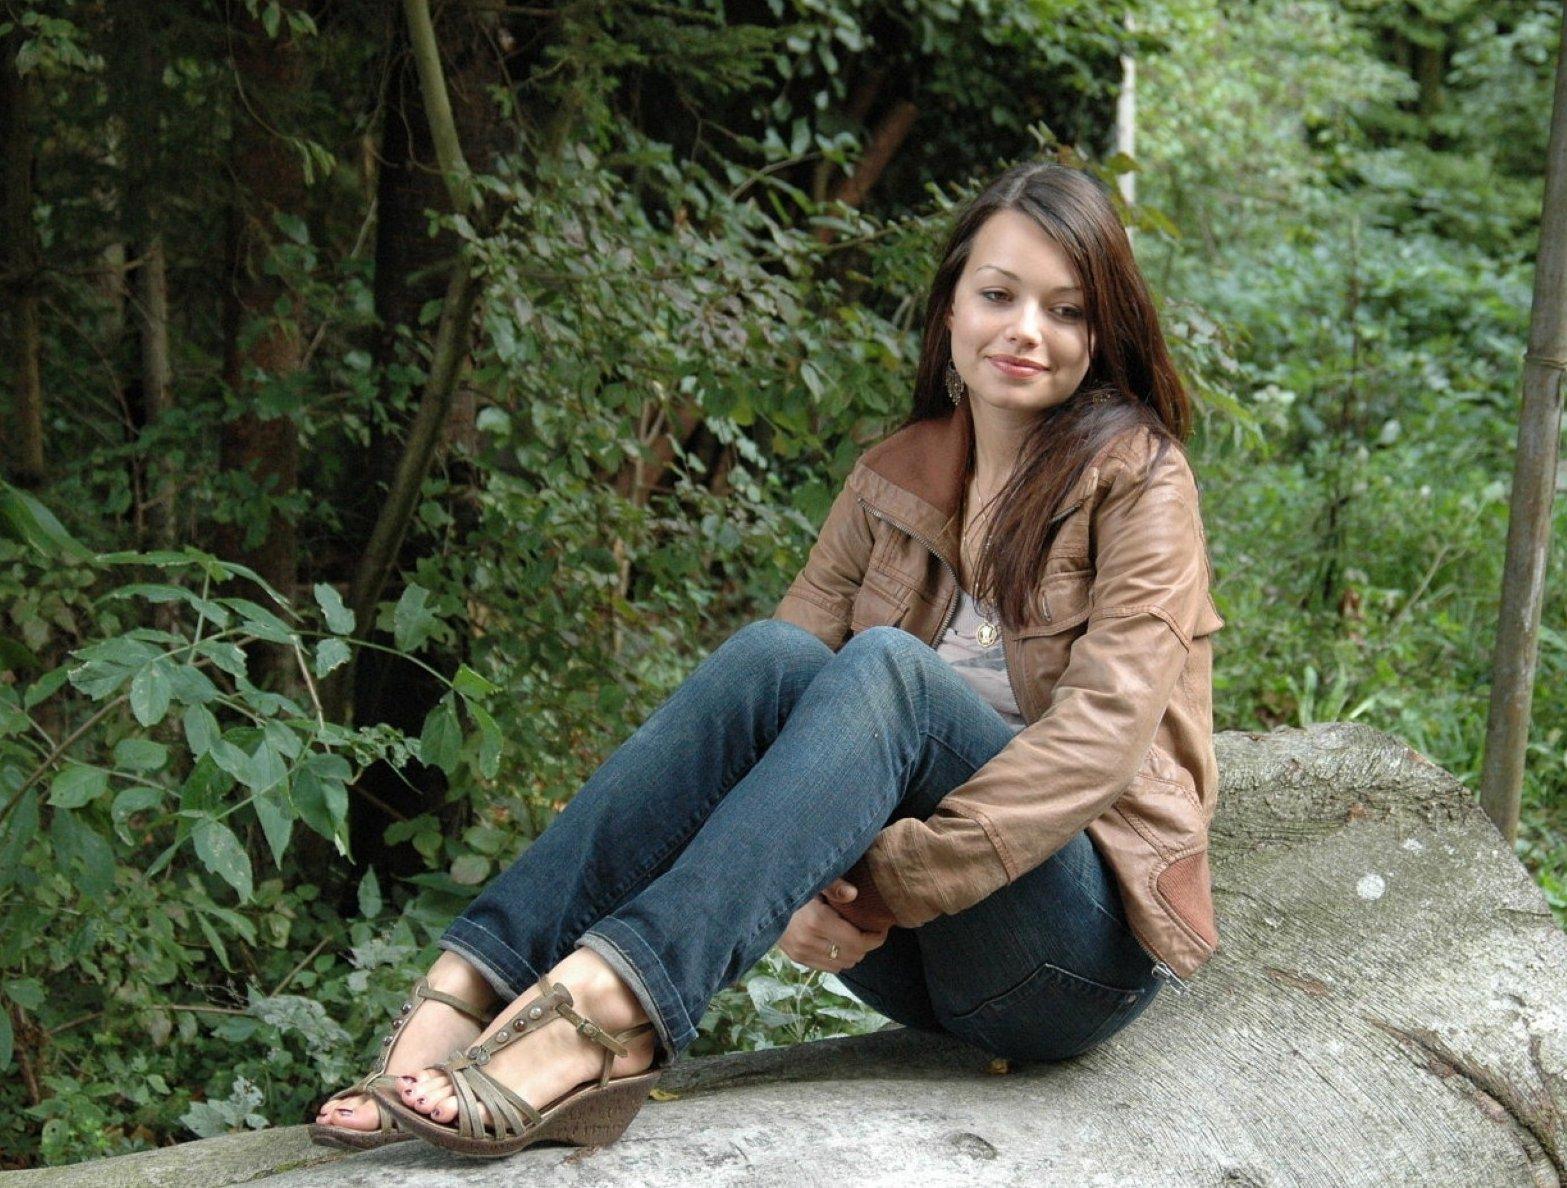 http://4.bp.blogspot.com/_UaLWp72nij4/S6u9wRqdFOI/AAAAAAAAFMk/OCTqQrXmRZE/s1600/cosma-shiva-hagen-feet.jpg